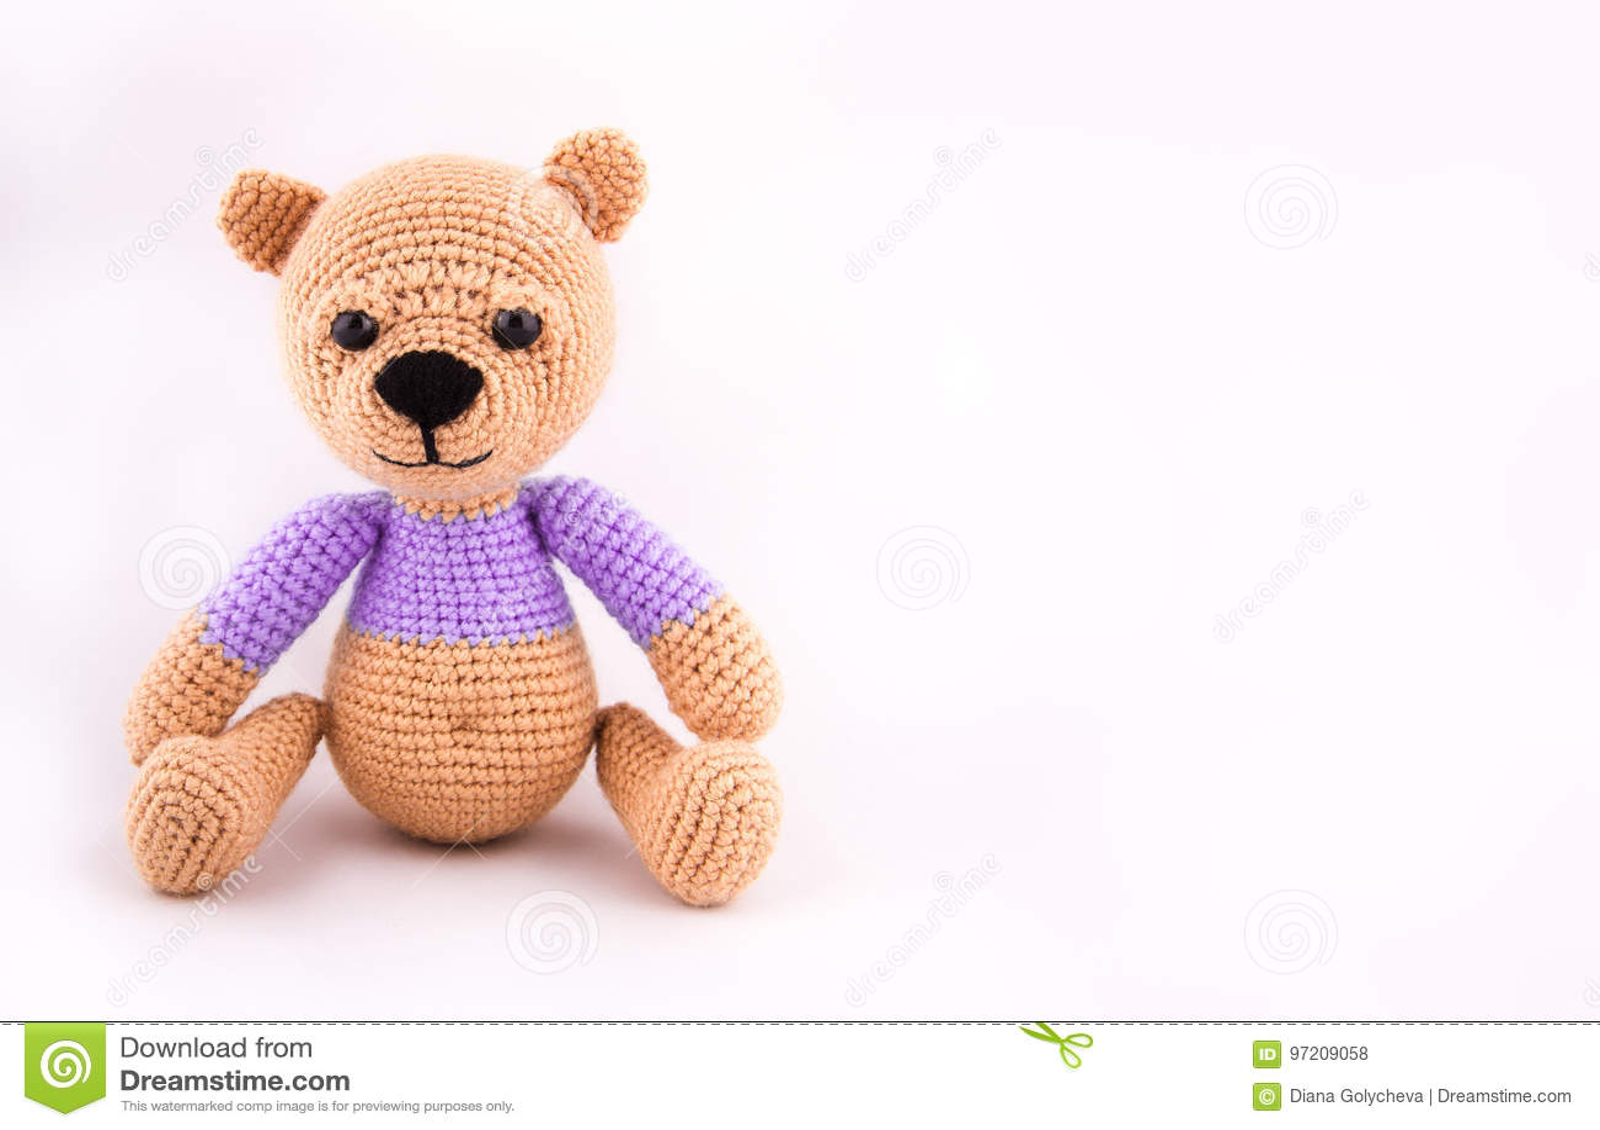 Teddy bear crochet dress (With images) | Crochet bear, Crochet ... | 935x1300